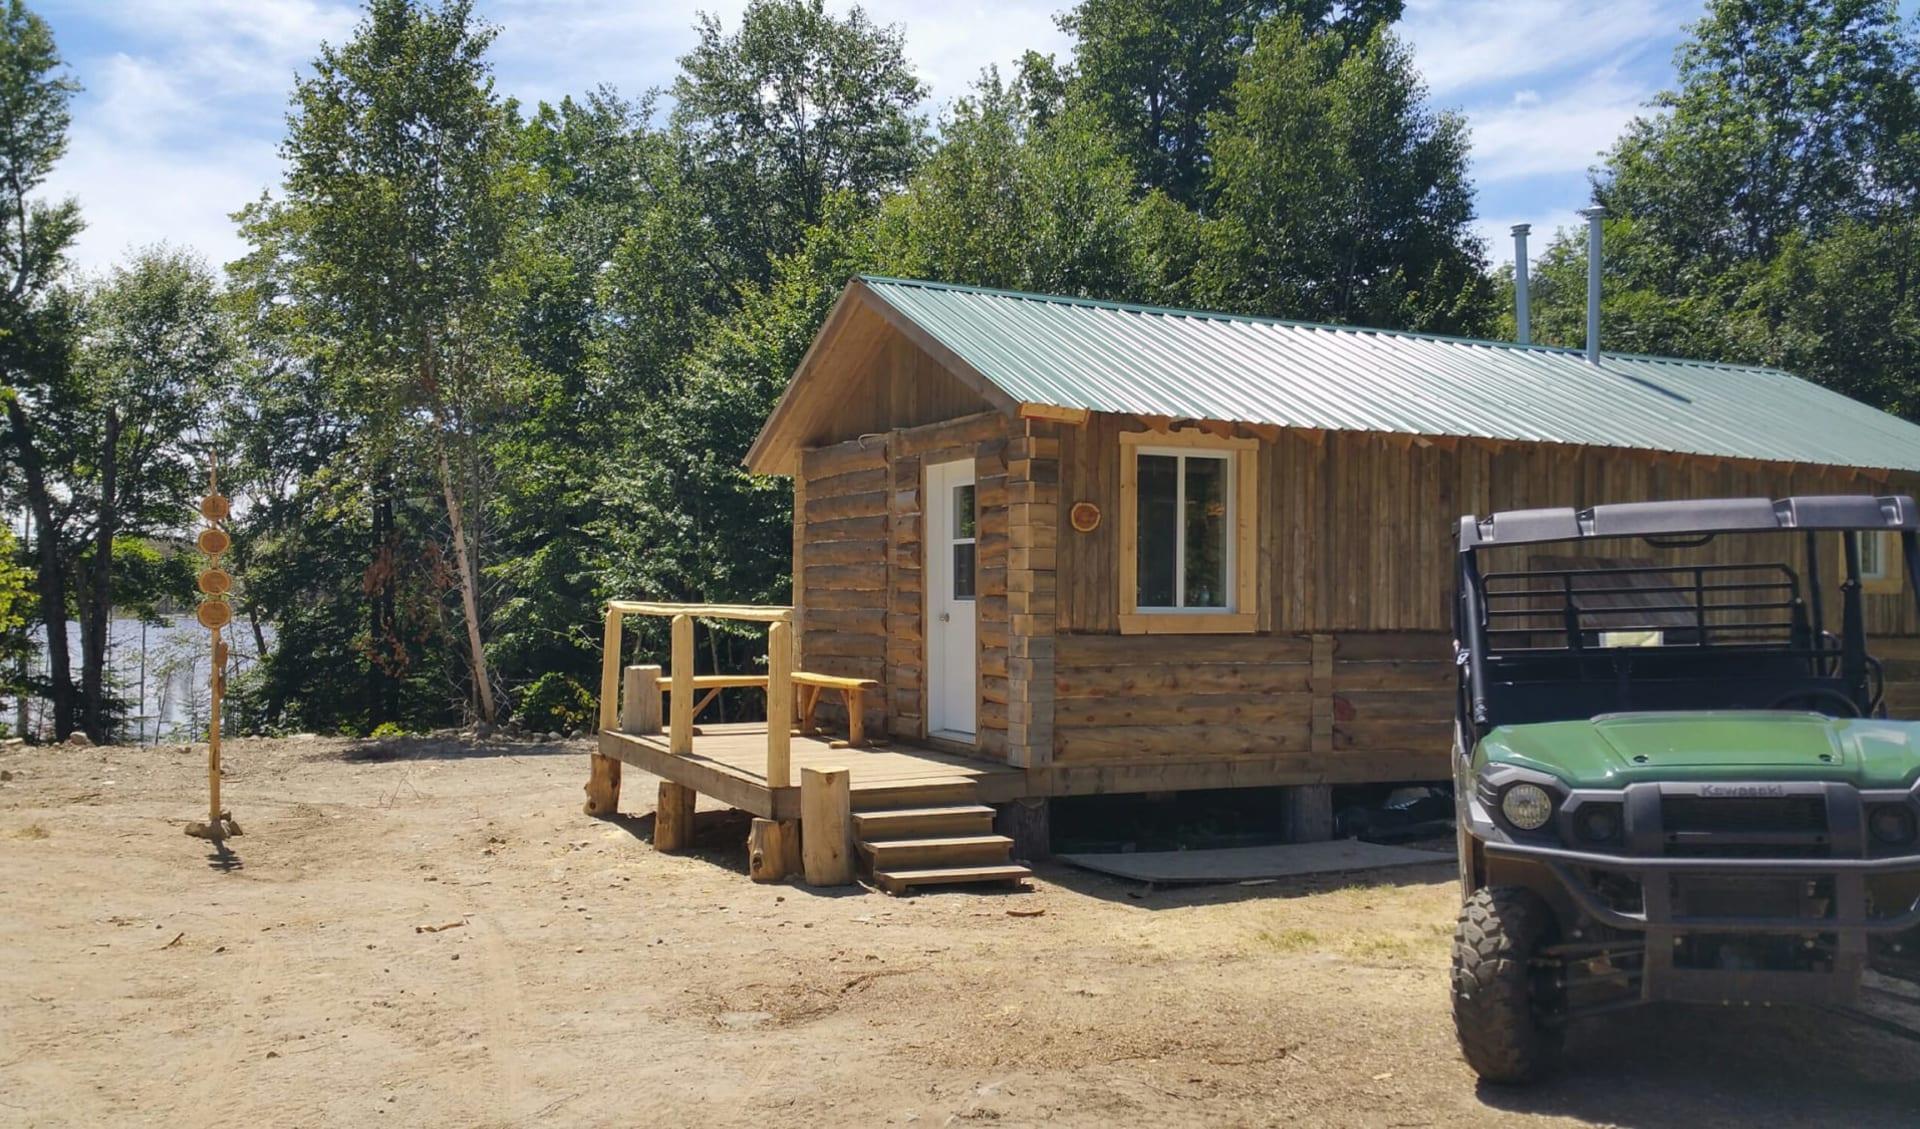 Amishk - Indianer Abenteuer Montcalm Regional Park ab St-Calixte: Kanada - Quebec - Amishk Indianer Abenteuer - Blockhaus